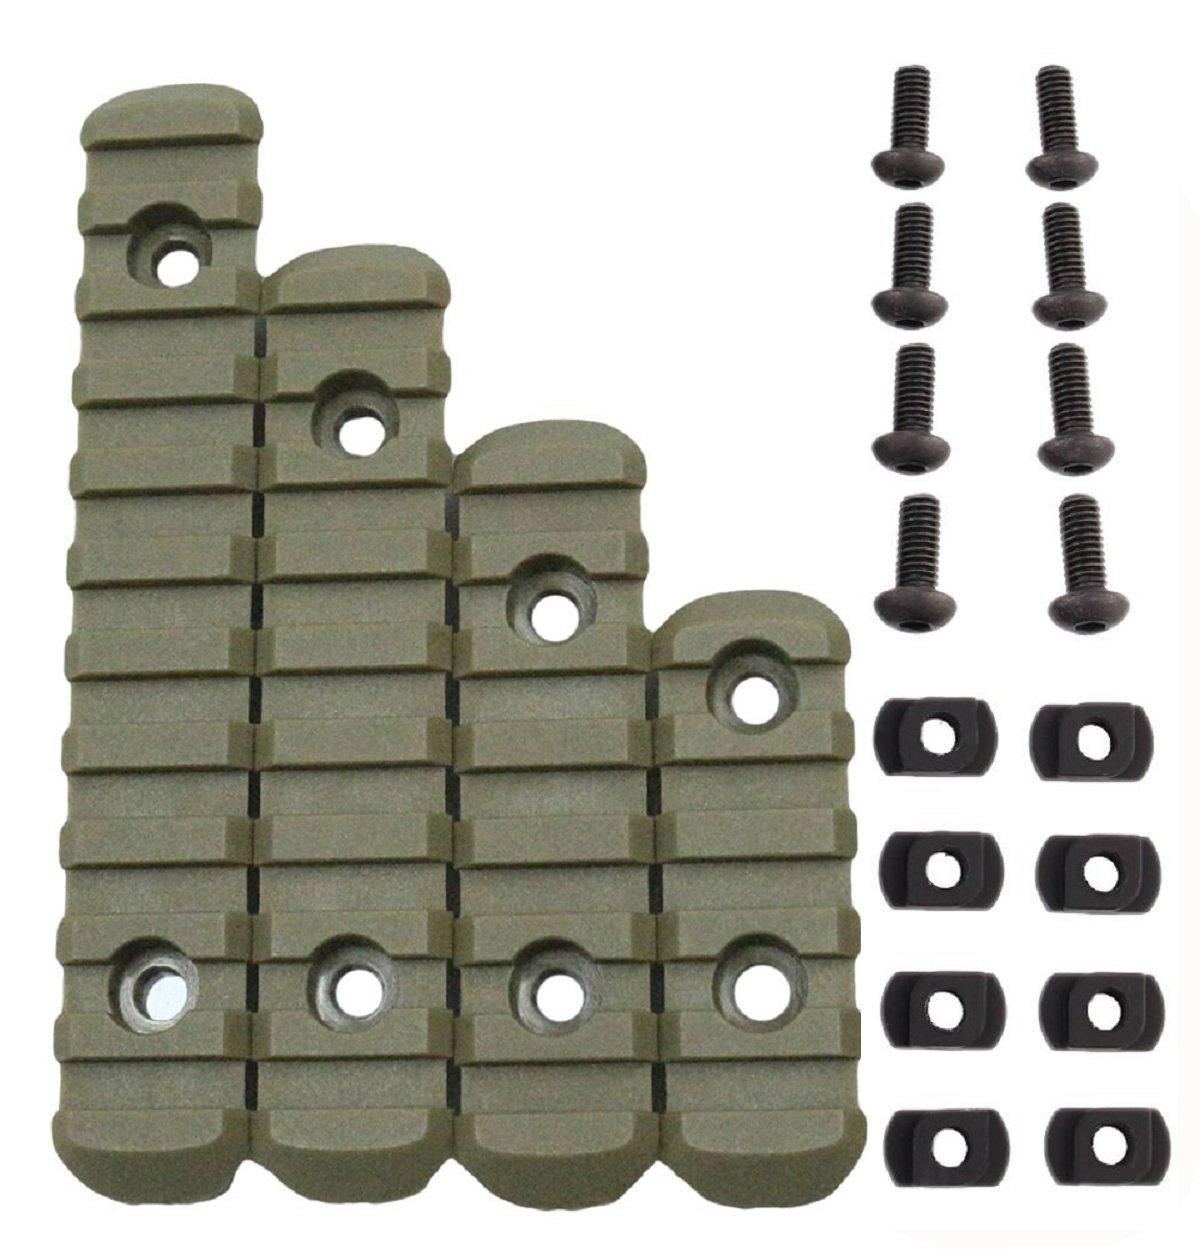 GVN Polymer 5, 7, 9, 11 Slots M-LOK Rail Section Fits M-LOK Hand Guard (Tan)